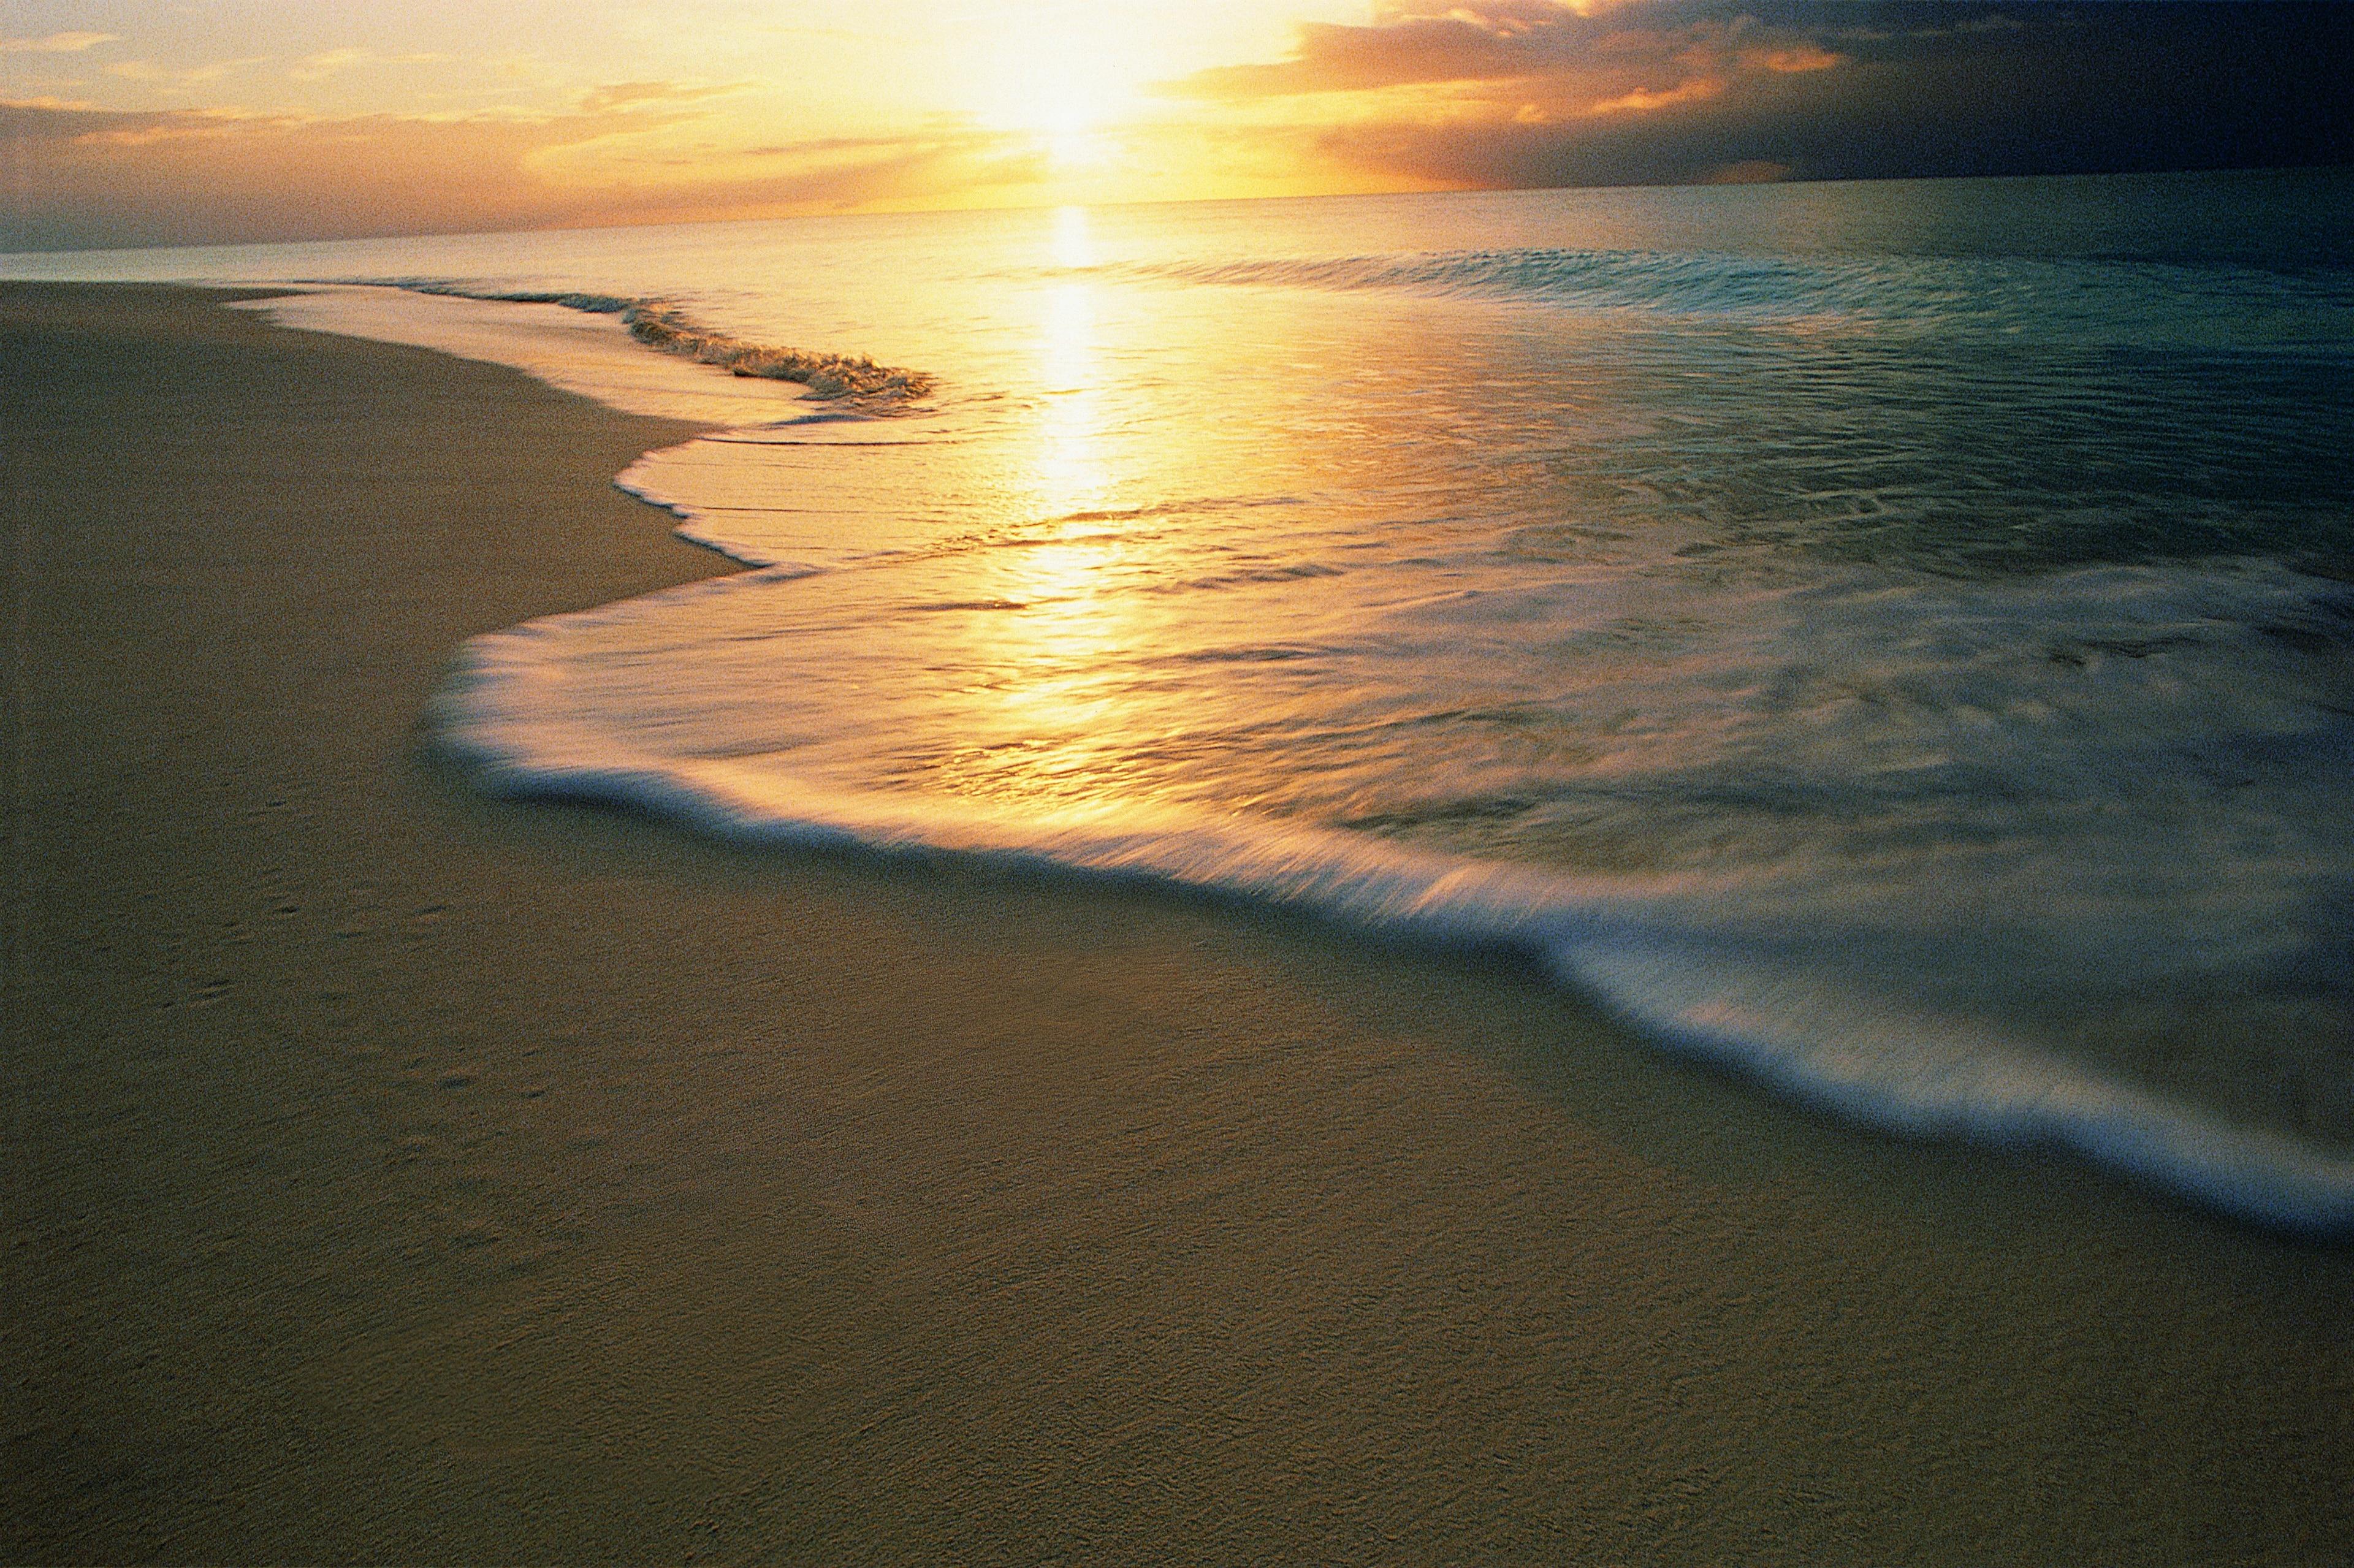 Kingshill, St. Croix Island, U.S. Virgin Islands